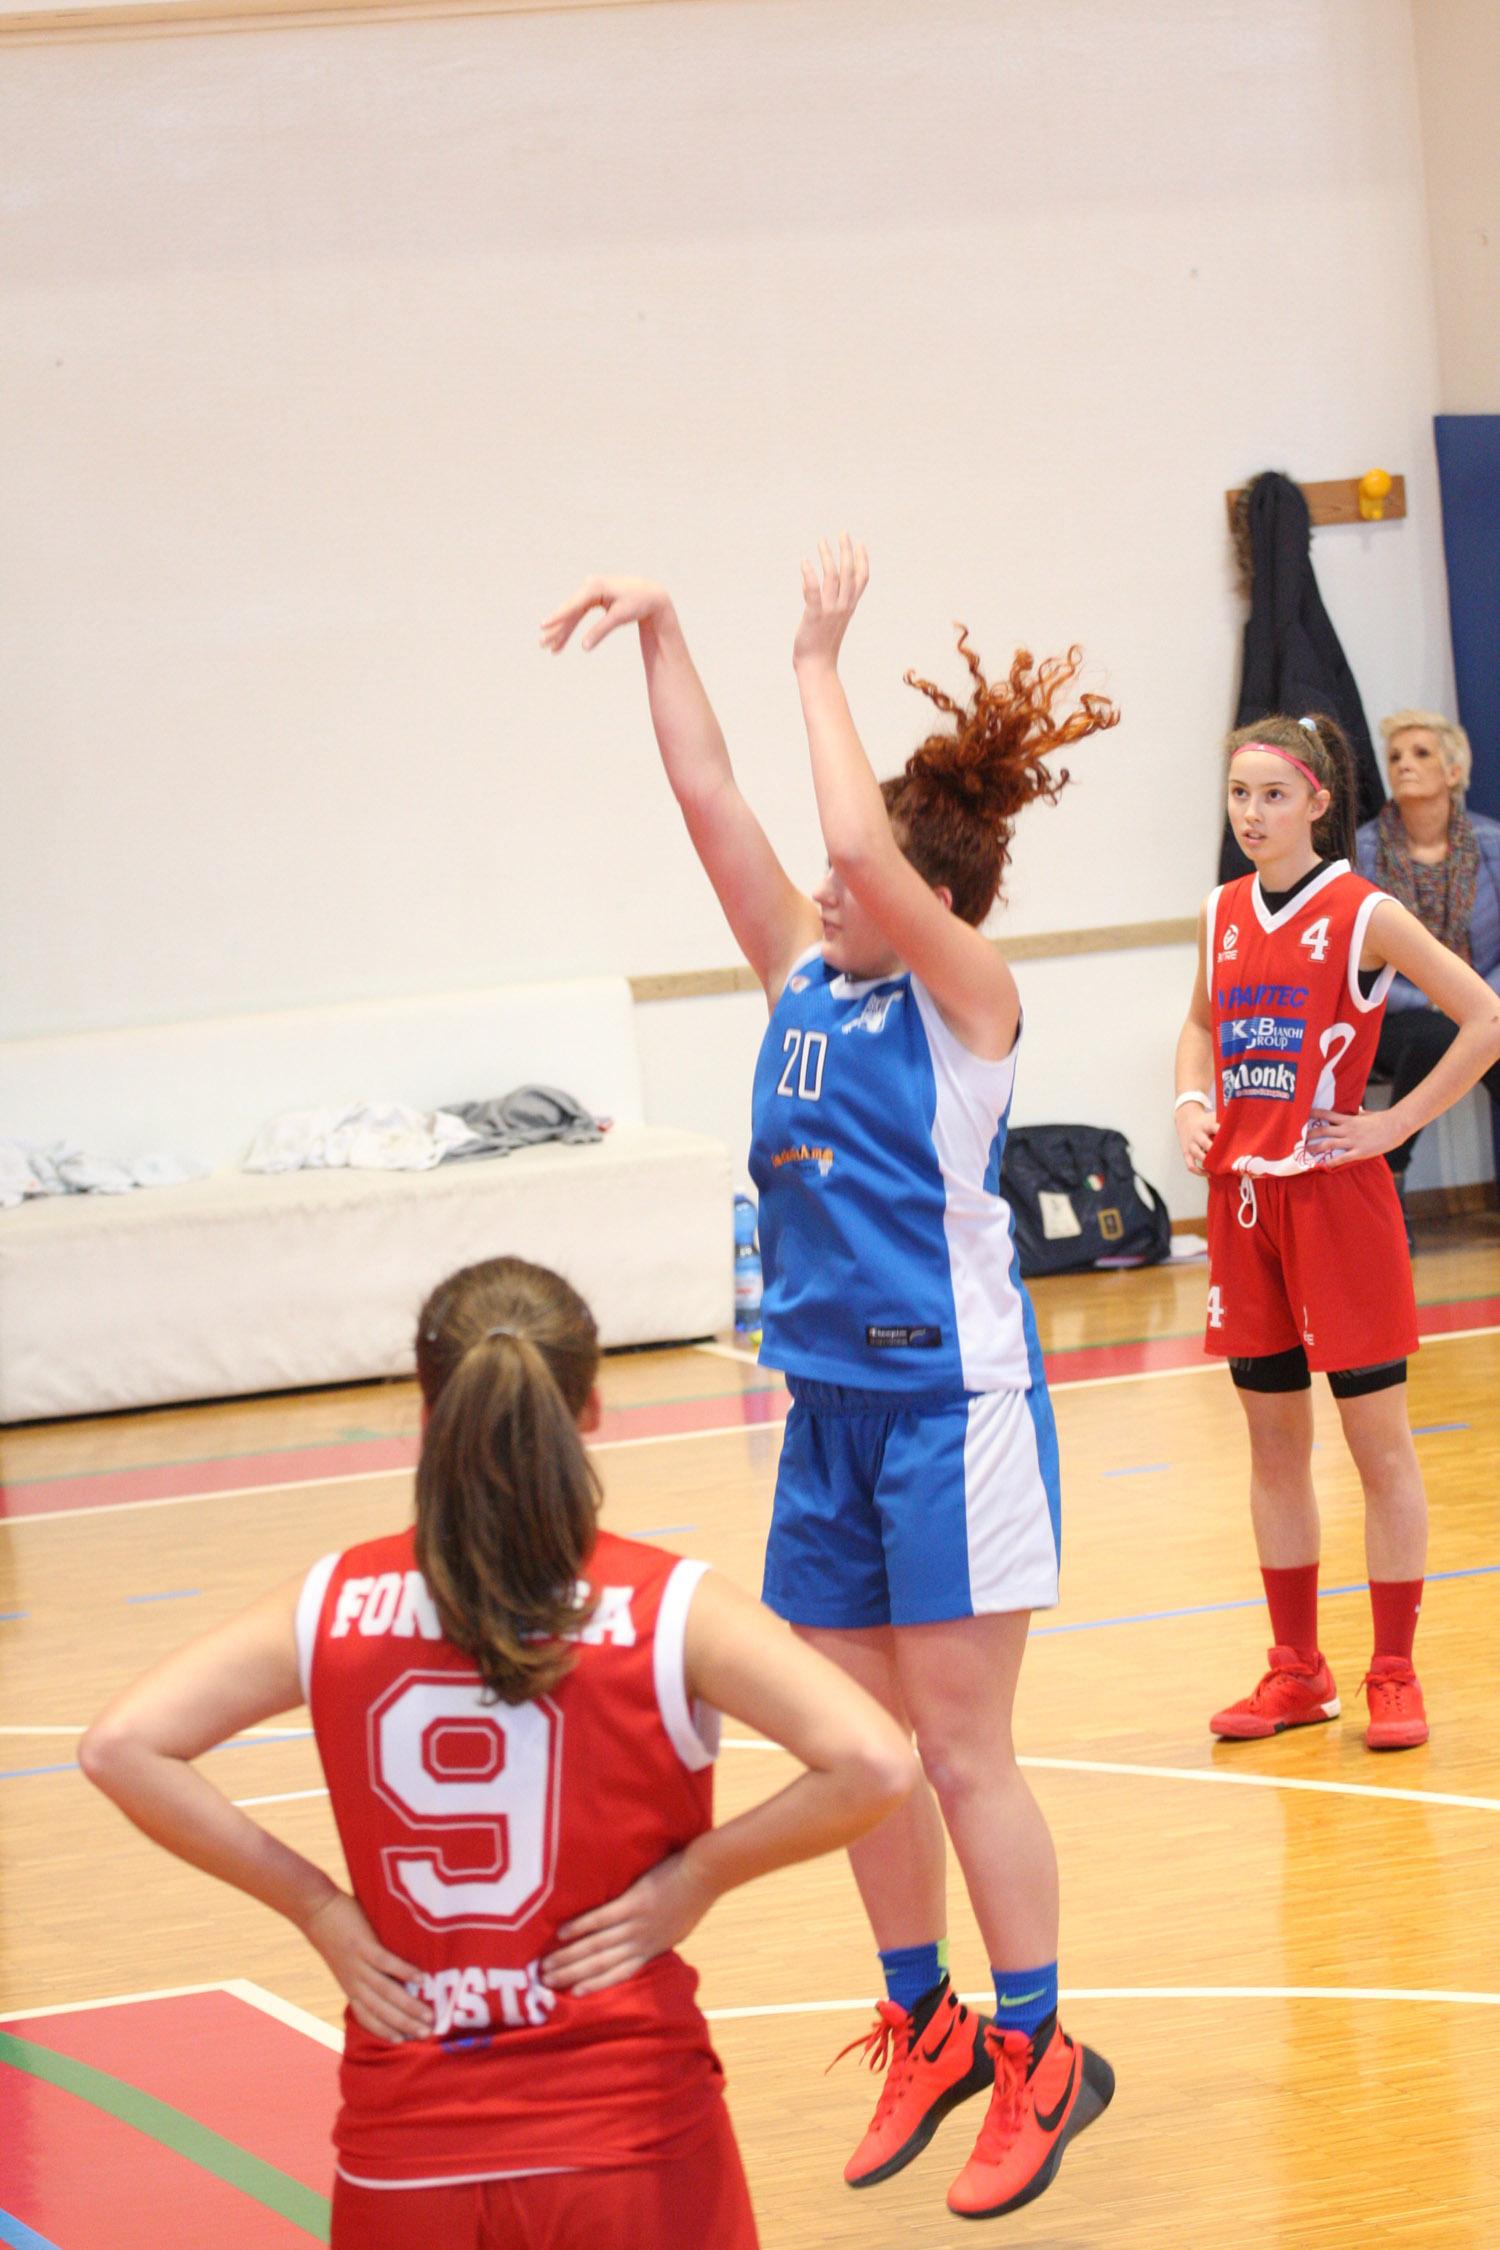 U16E - Costa Masnaga vs Baskettiamo Vittuone 2001 00021.jpg